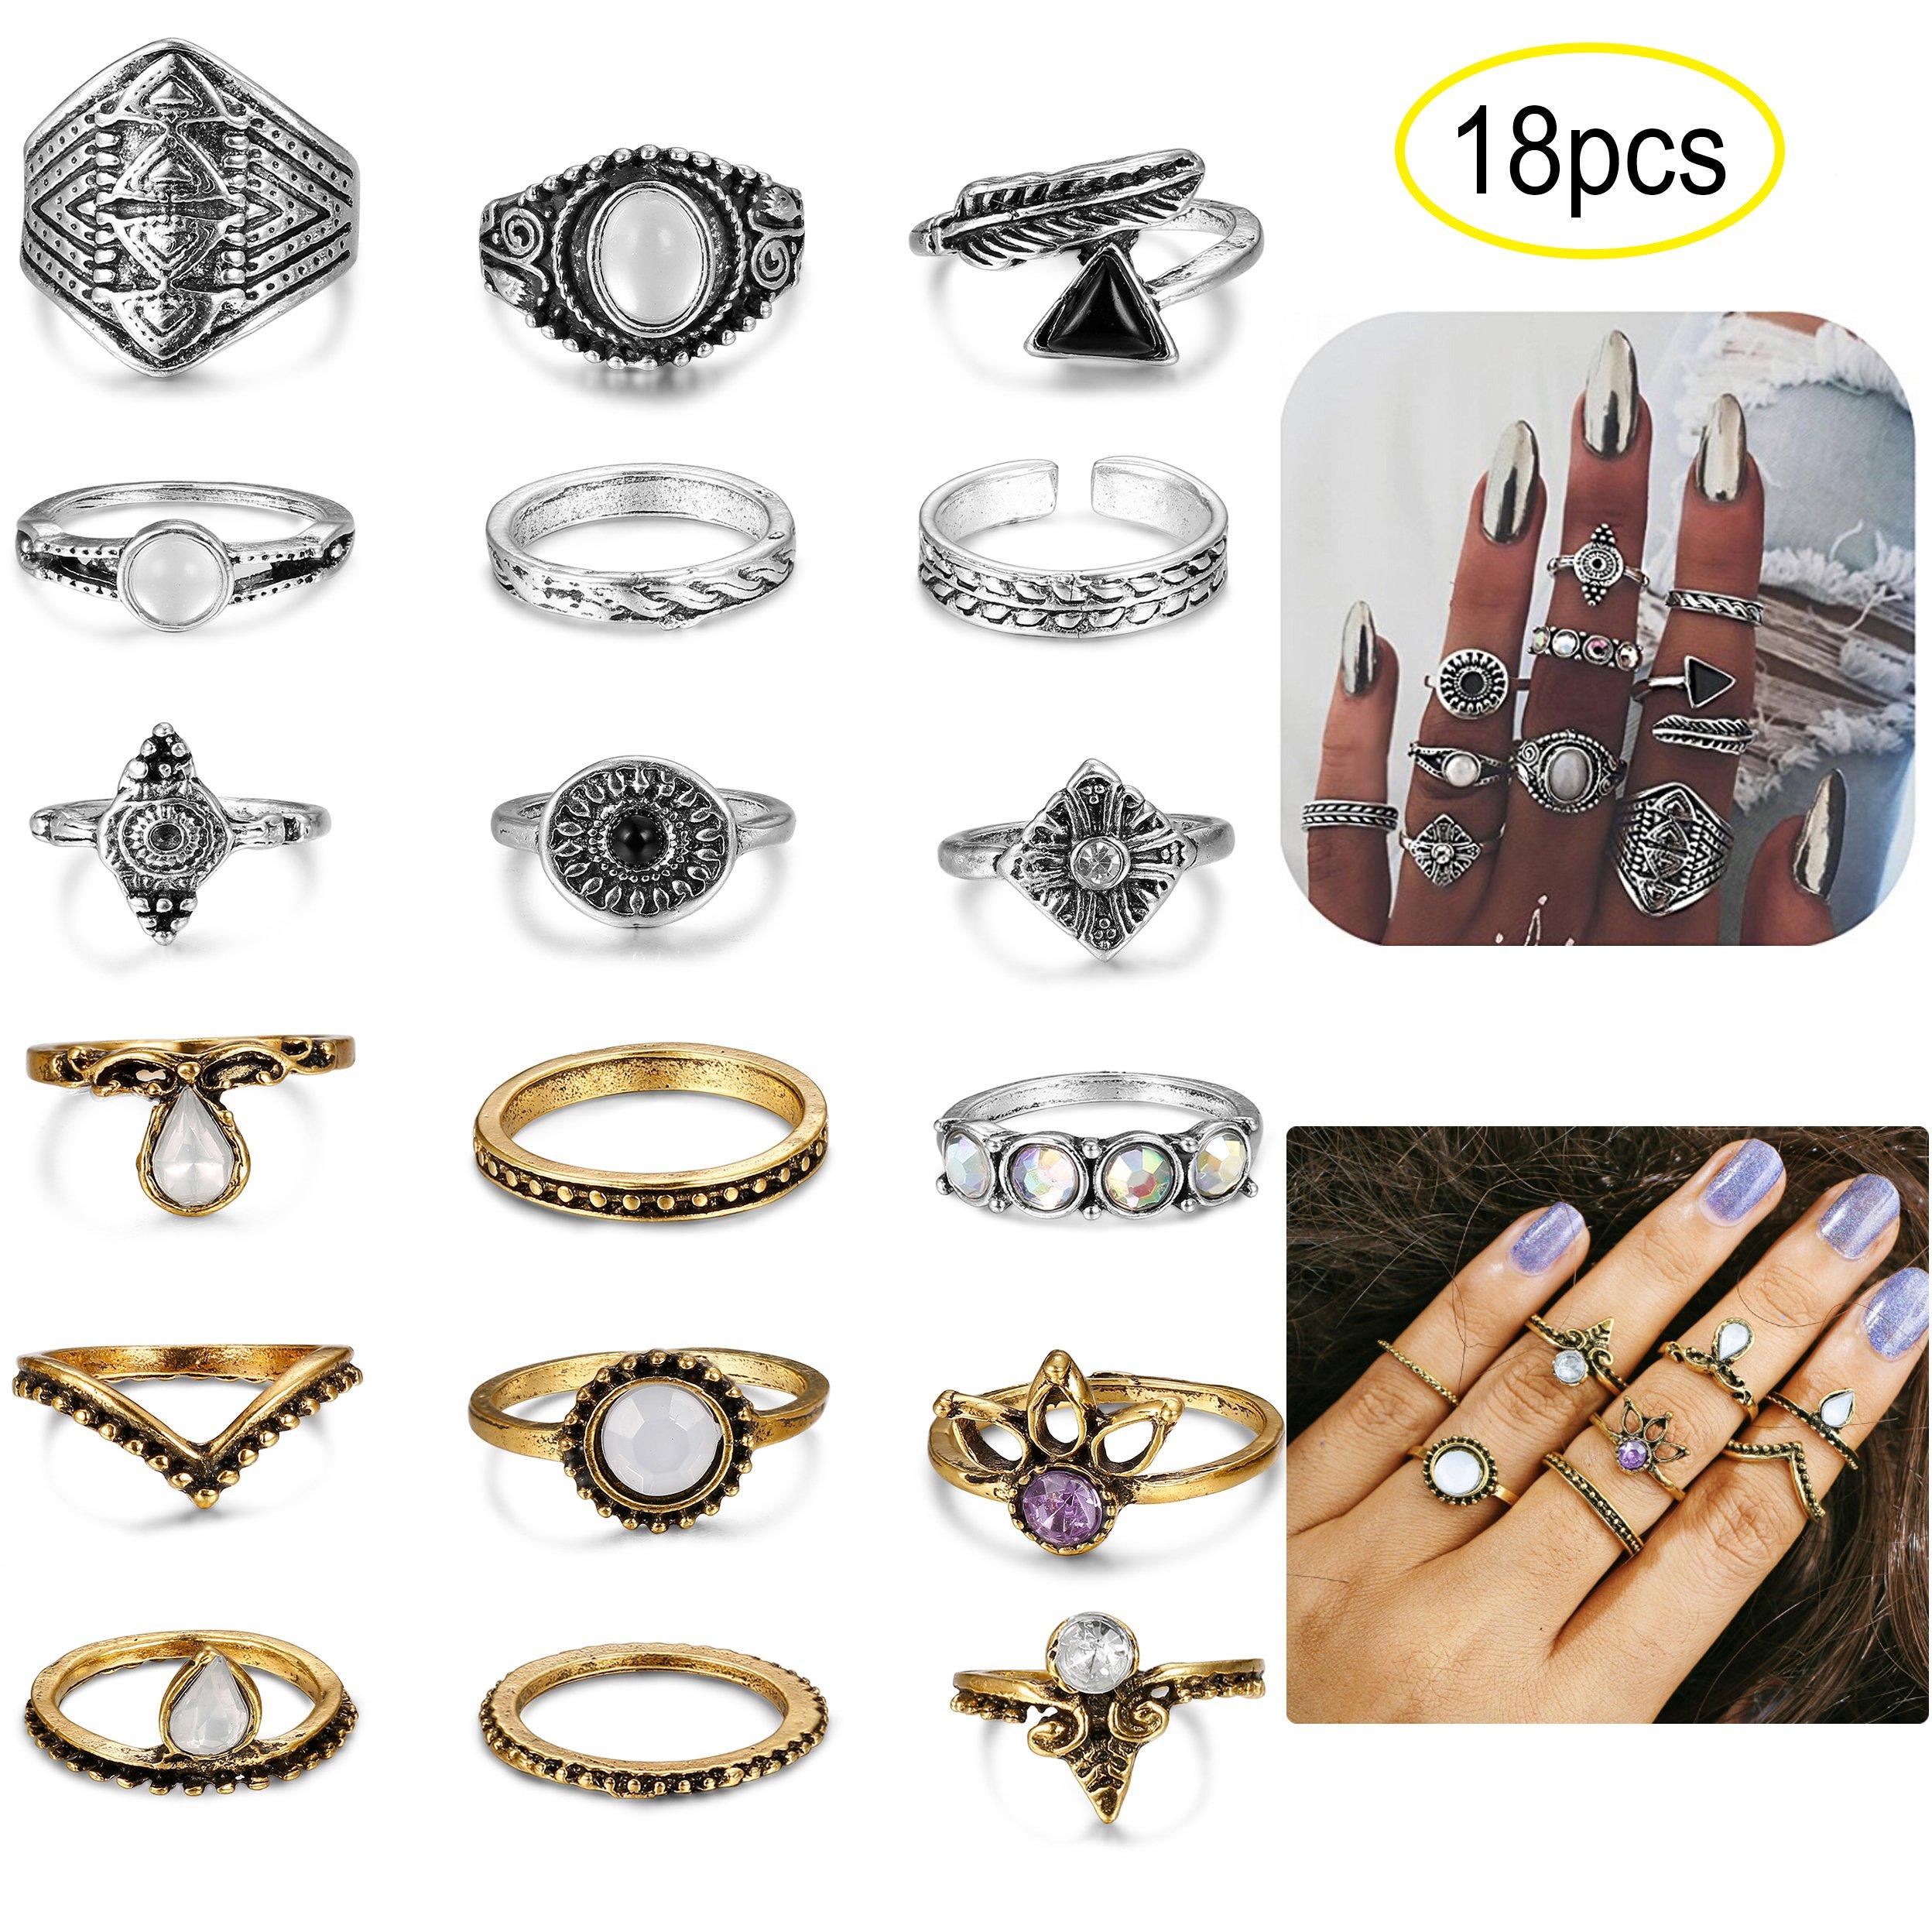 LOYALLOOK 16-18PCS Bohemian Vintage Knuckle Ring Set for Women Girls Stackable Rings Finger Toe Rings Set 18pcs